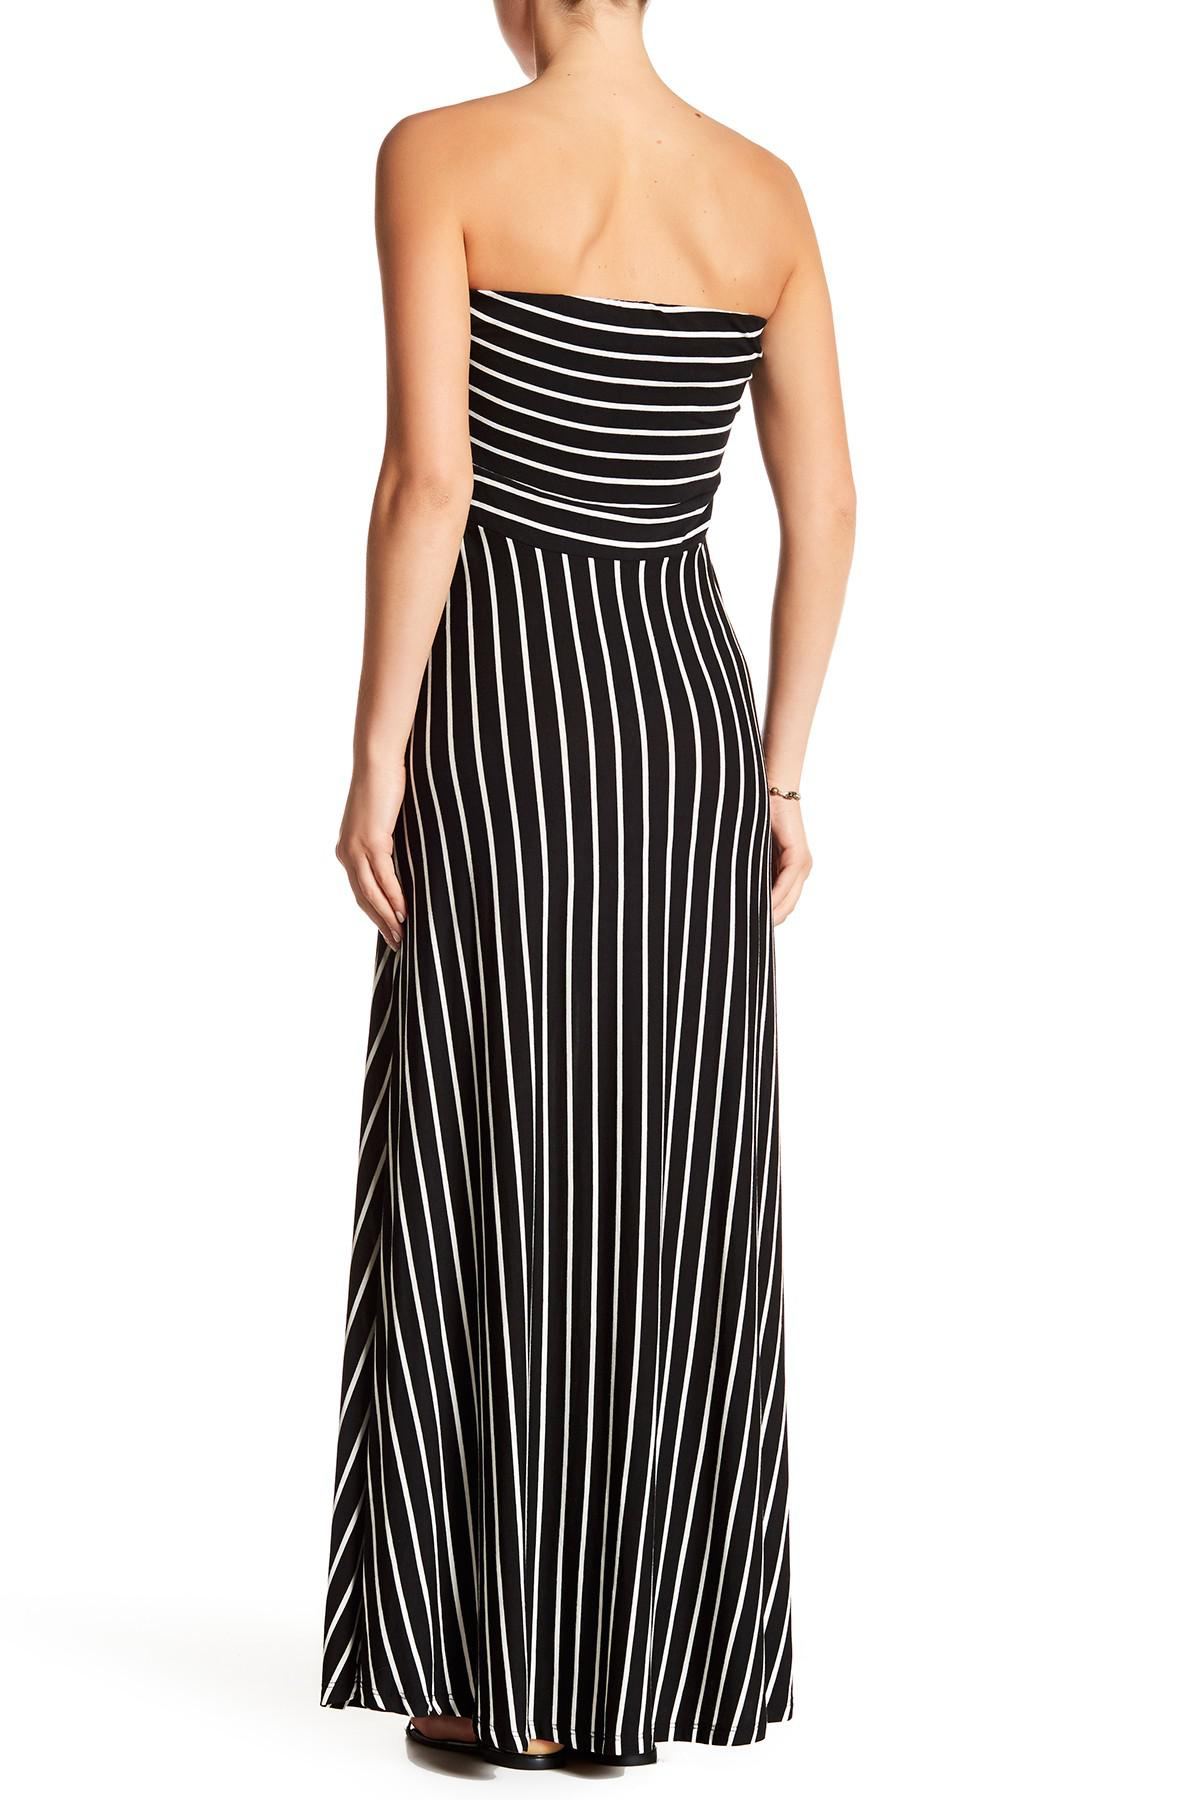 1d232e219b4 West Kei - Black Strapless Stripe Maxi Dress - Lyst. View fullscreen